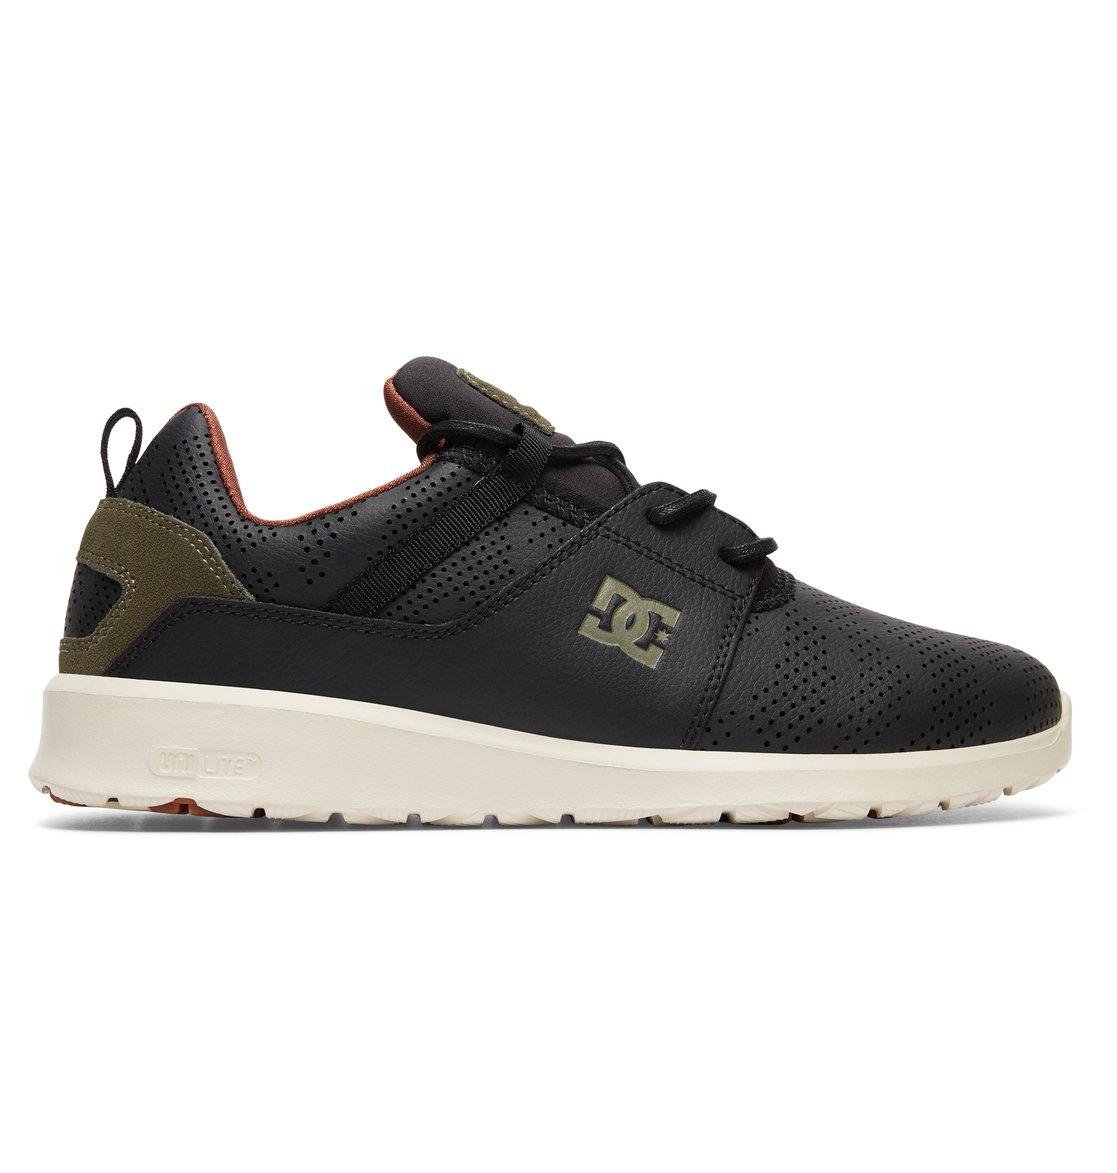 Chaussures DC Shoes Heathrow SE noires Casual homme qym15